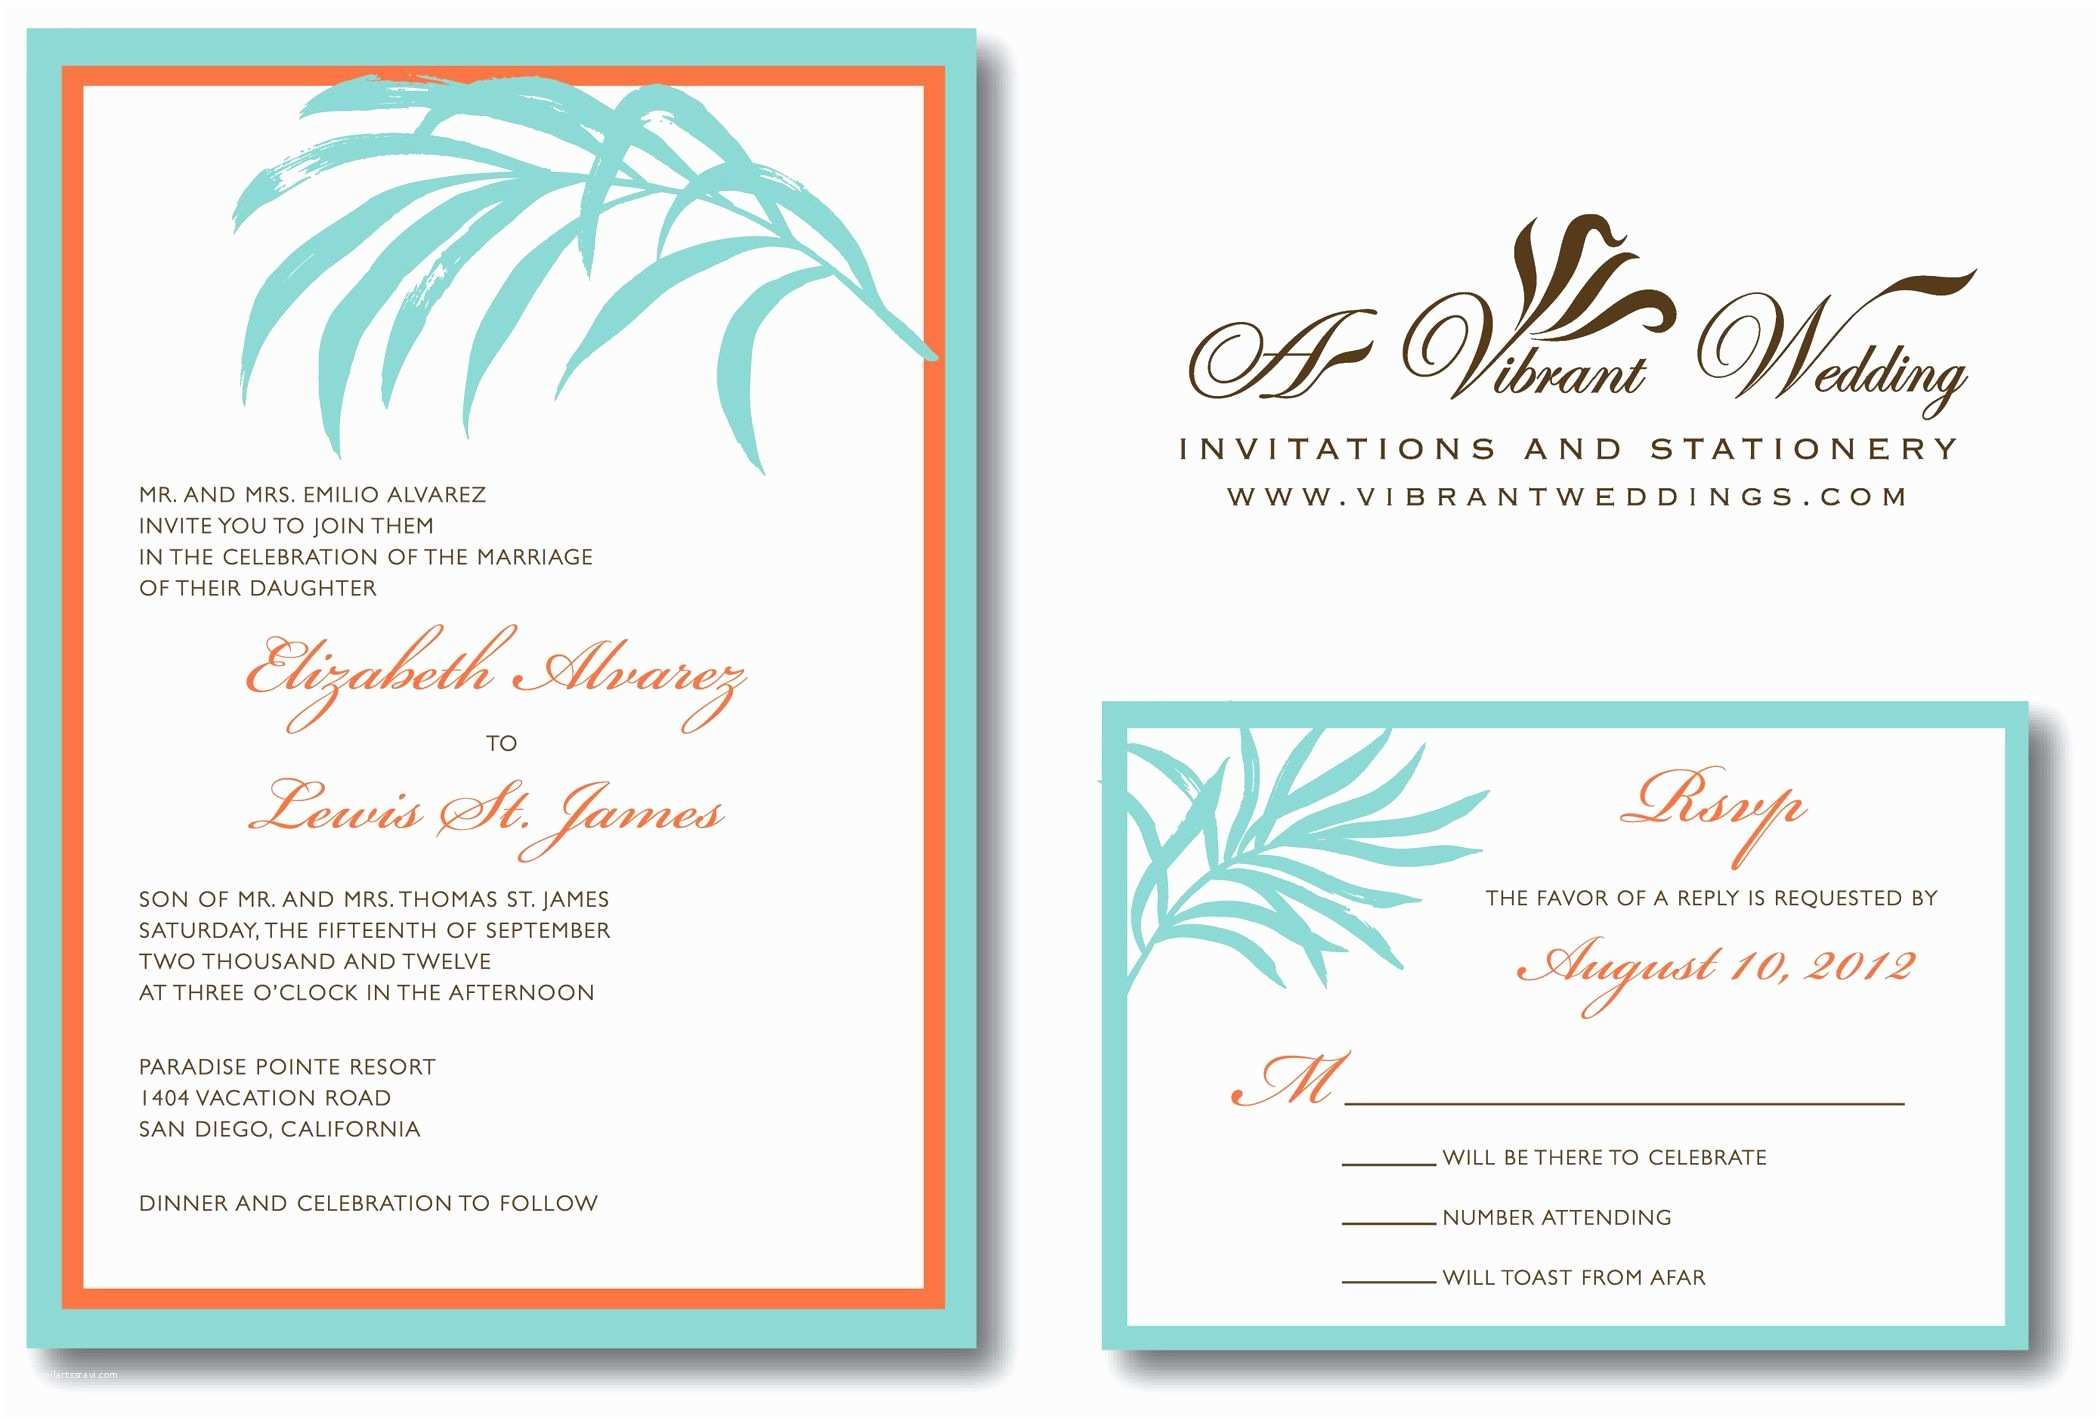 Beach Wedding Invitation Wording Beach Wedding Invitations Wording Beach Wedding